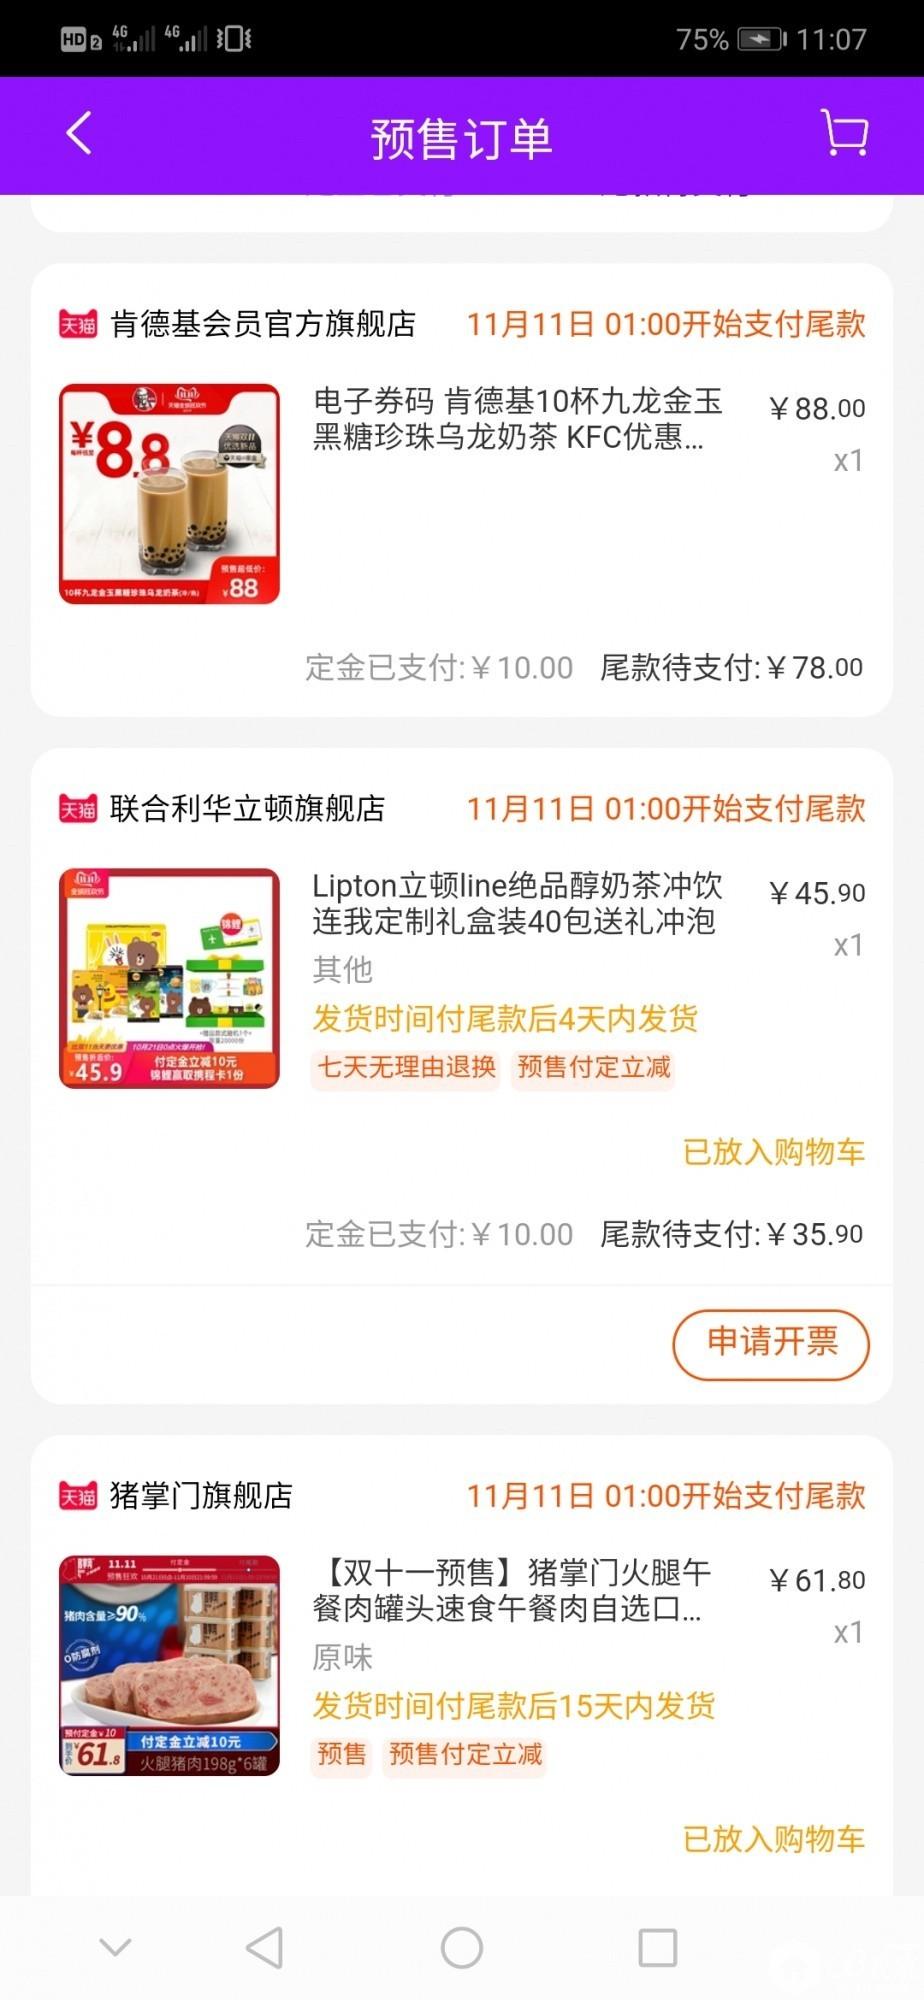 Screenshot_20191031_230759_com.taobao.taobao.jpg